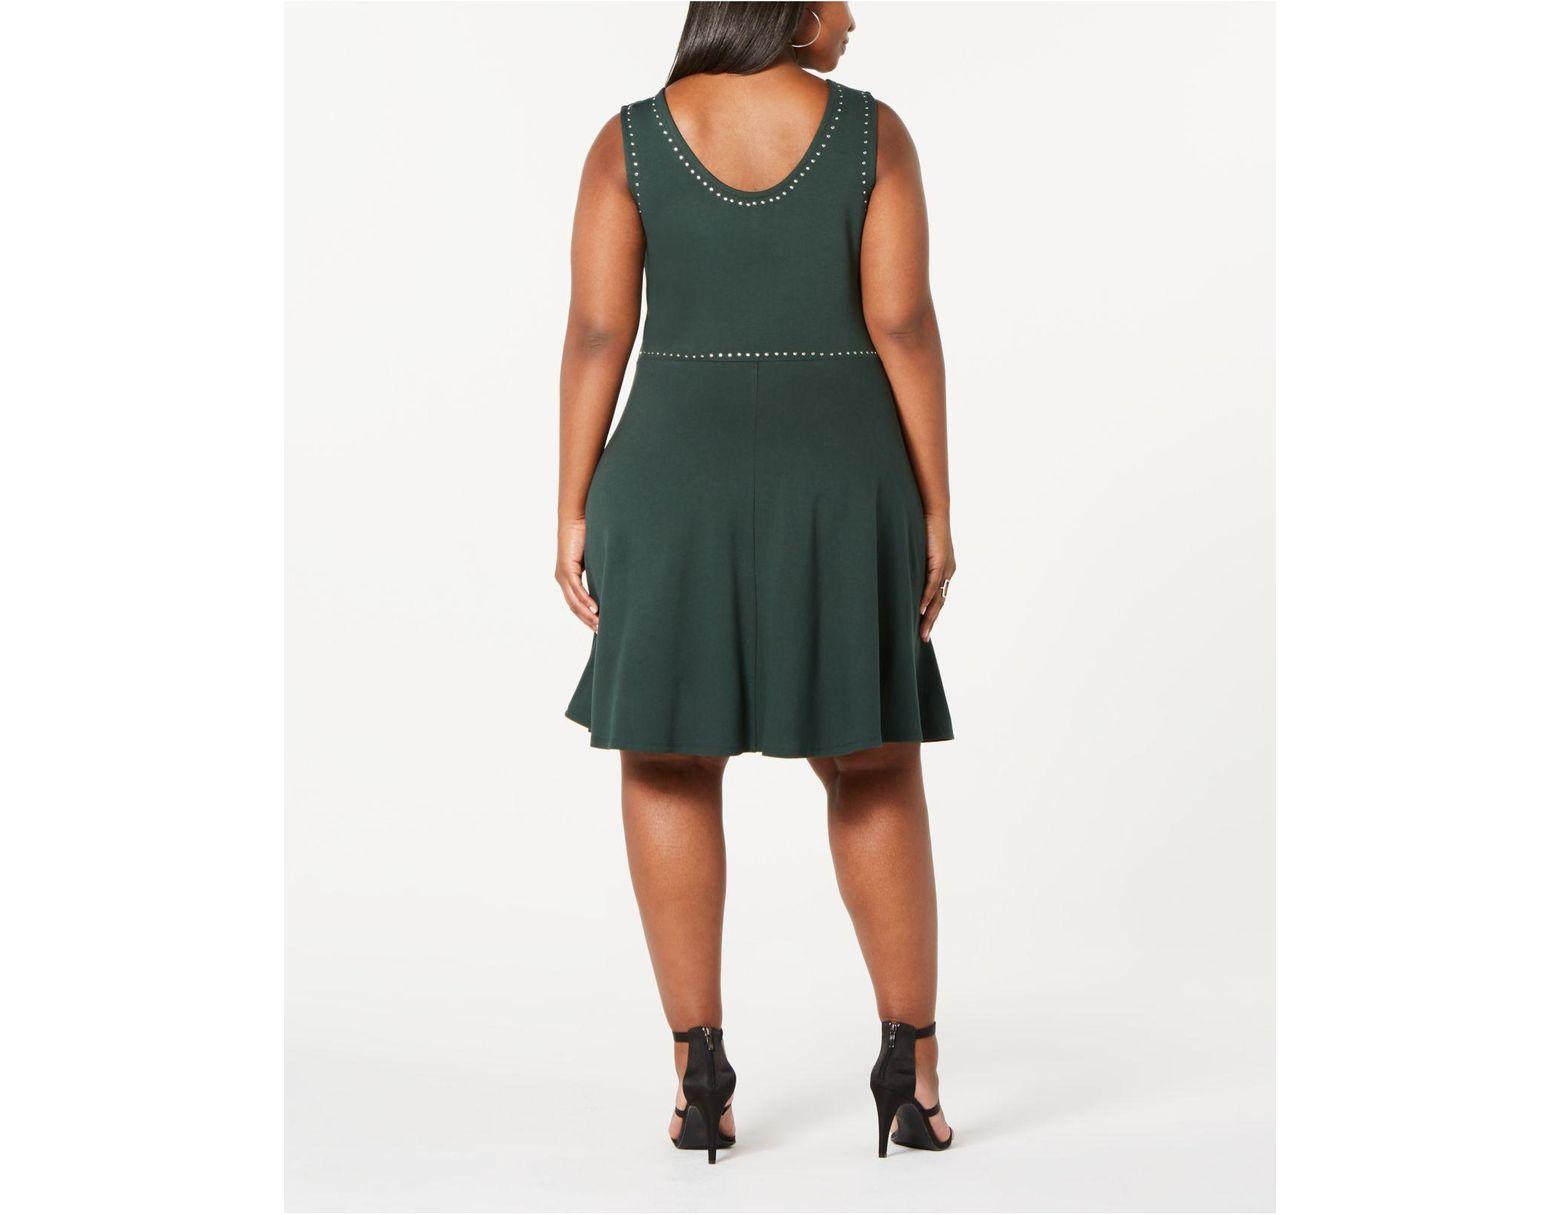 Derek Heart Trendy Plus Size Juniors\' Studded Tank Dress in ...